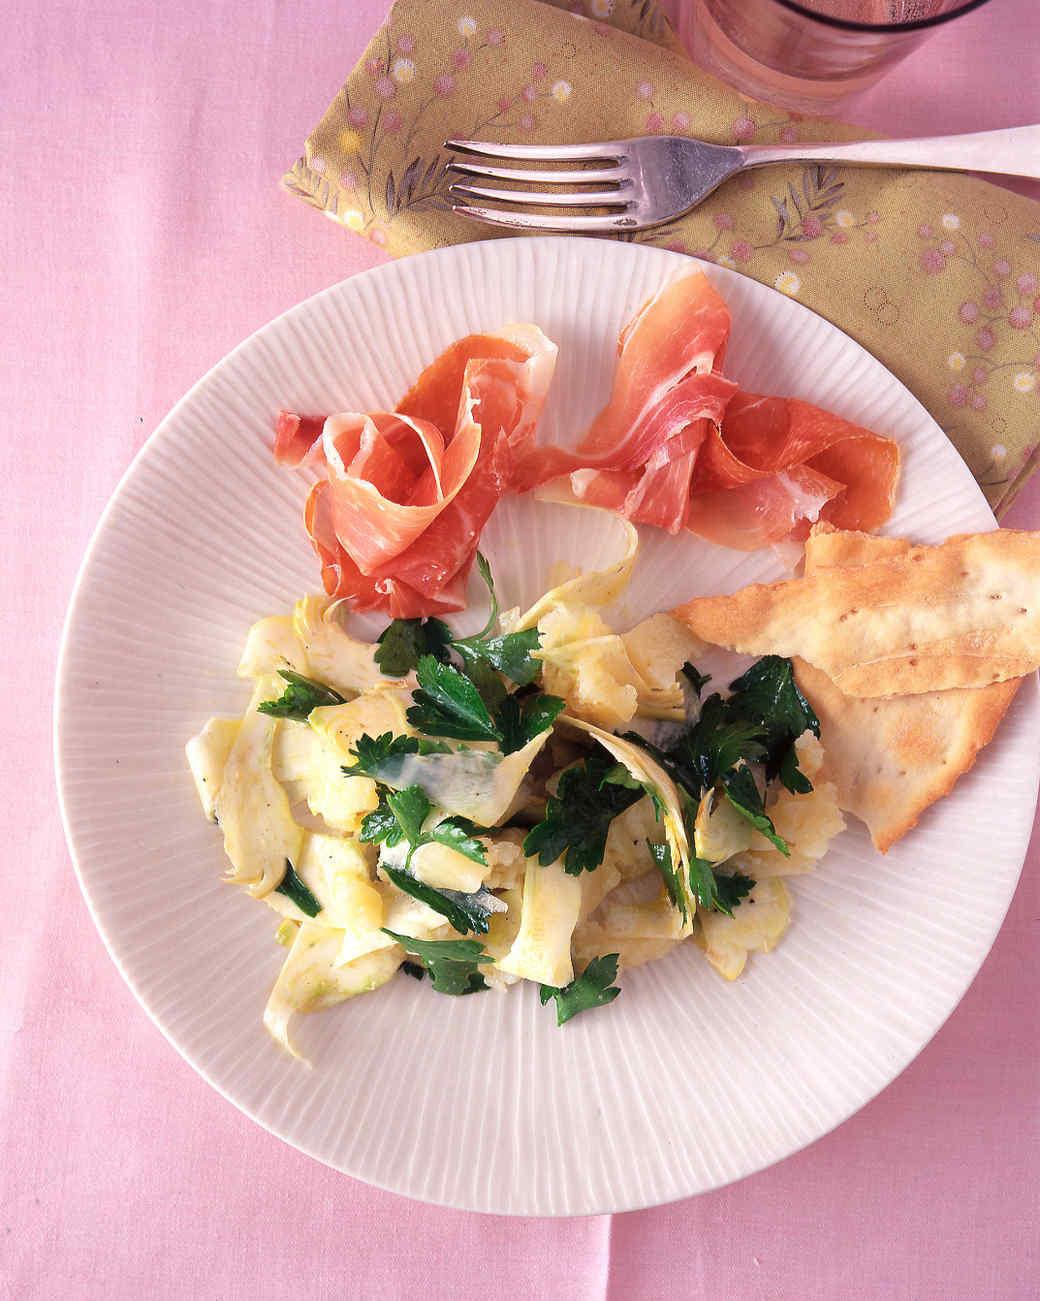 Shaved-Artichoke and Parsley Salad with Serrano Ham